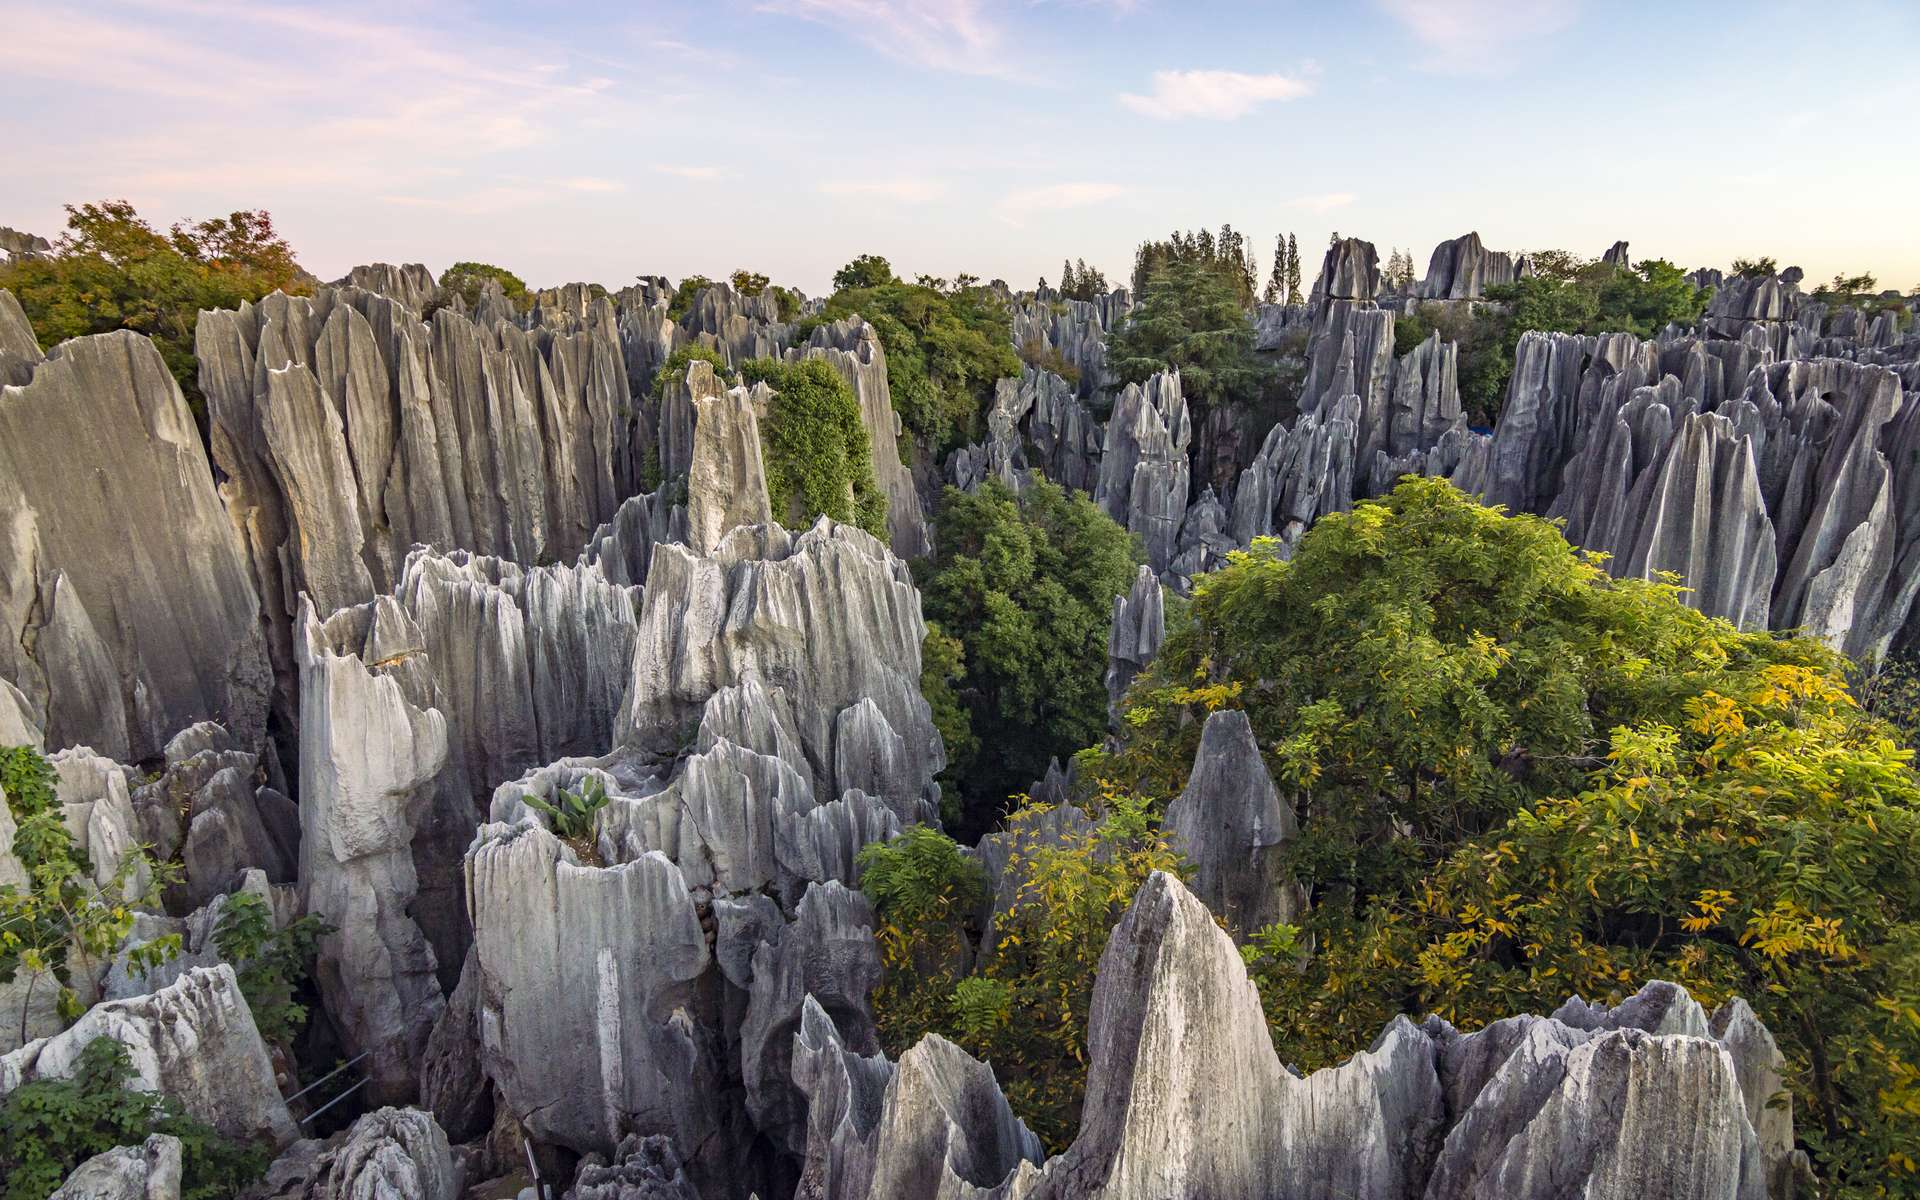 Le forêt de pierres de Shilin, dans la province du Yunnan (Chine). © Andrii_lutsyk, Adobe Stock